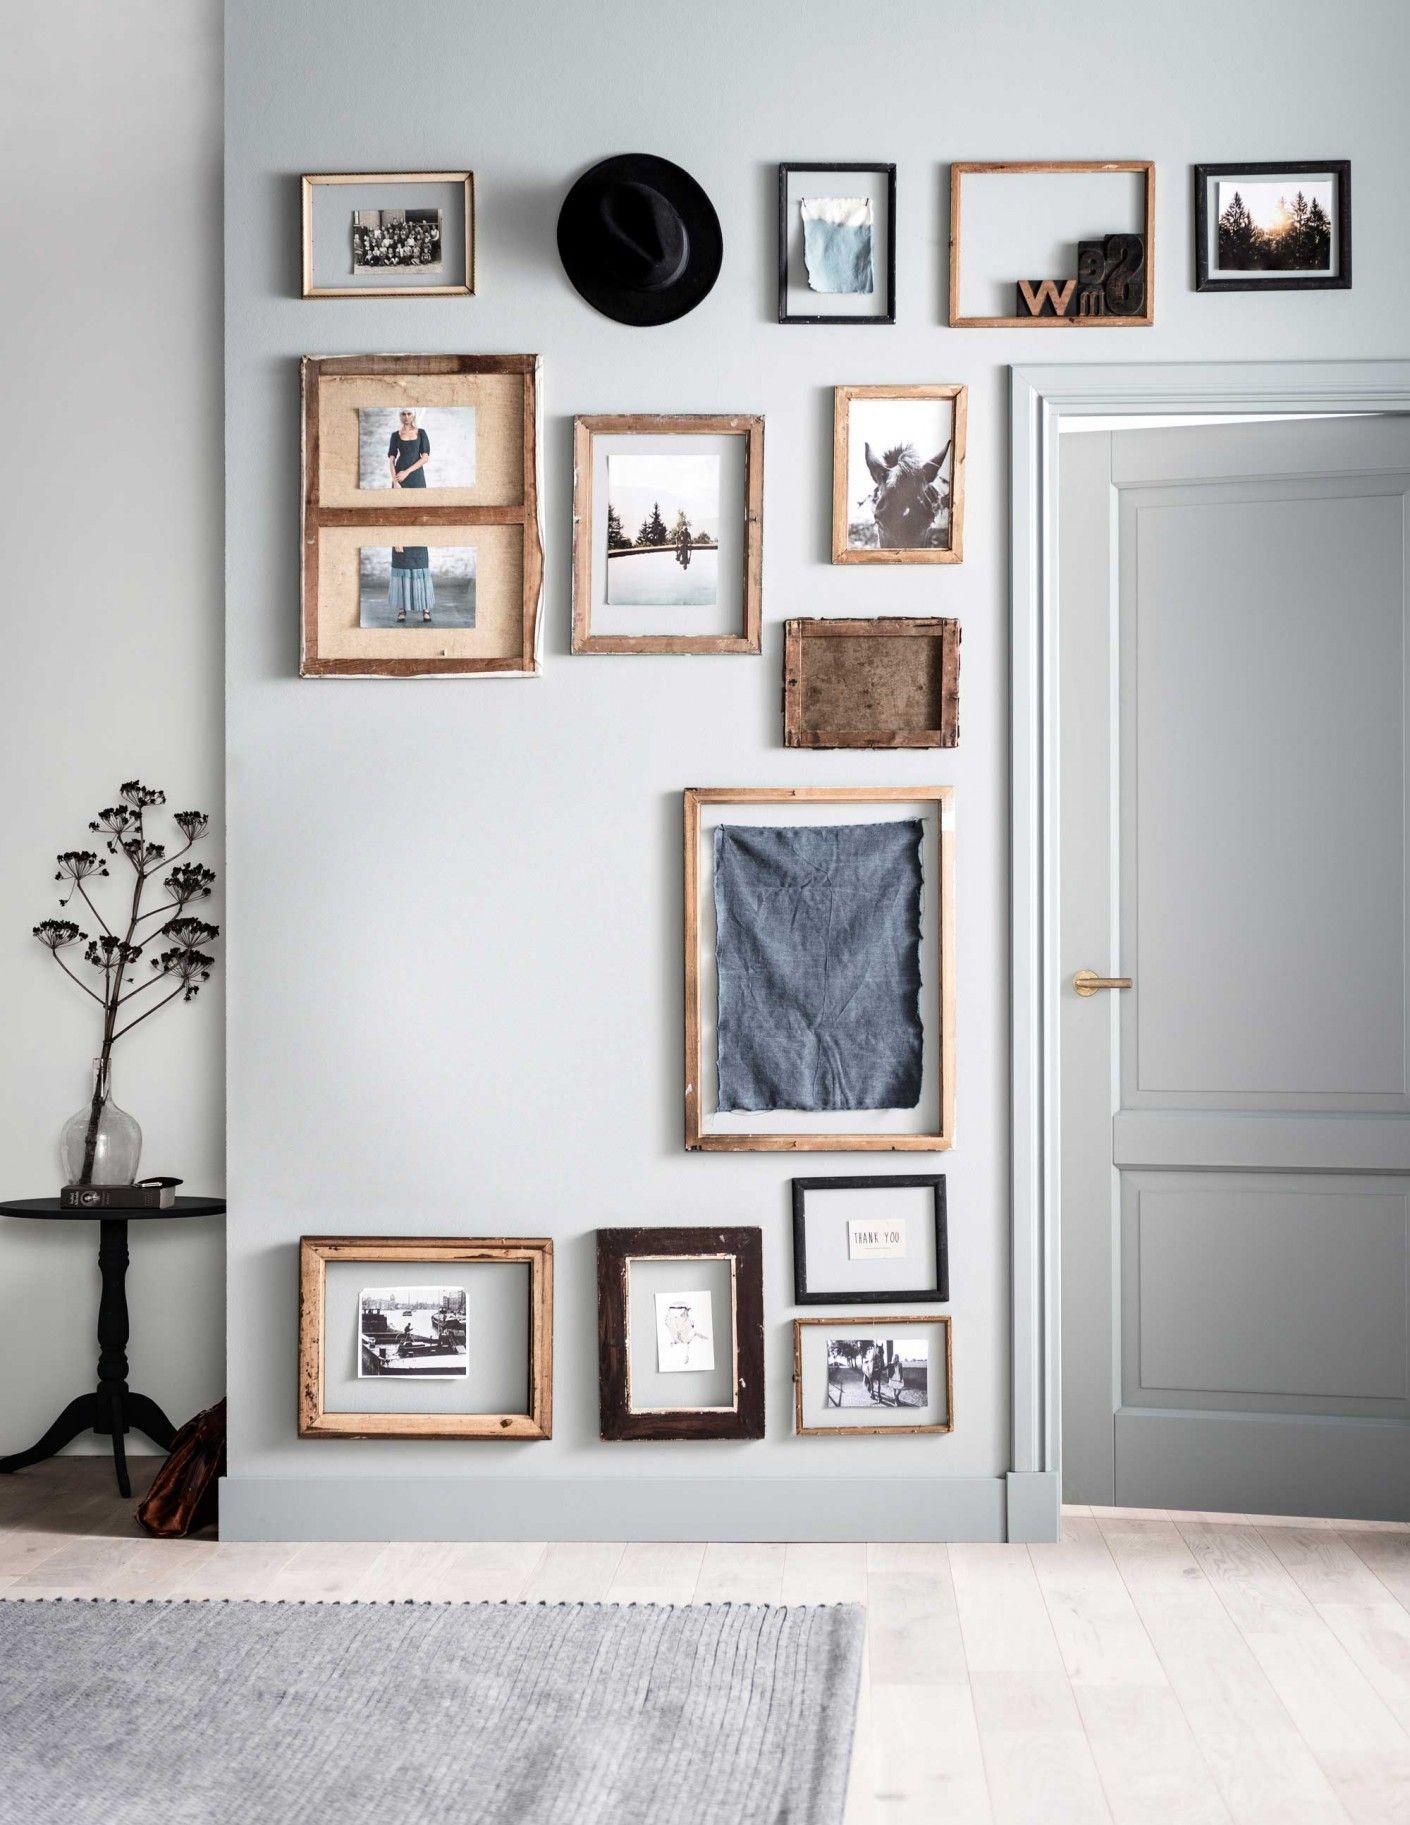 Zeegroene muur met lijstjes | Sea green wall with frames ...